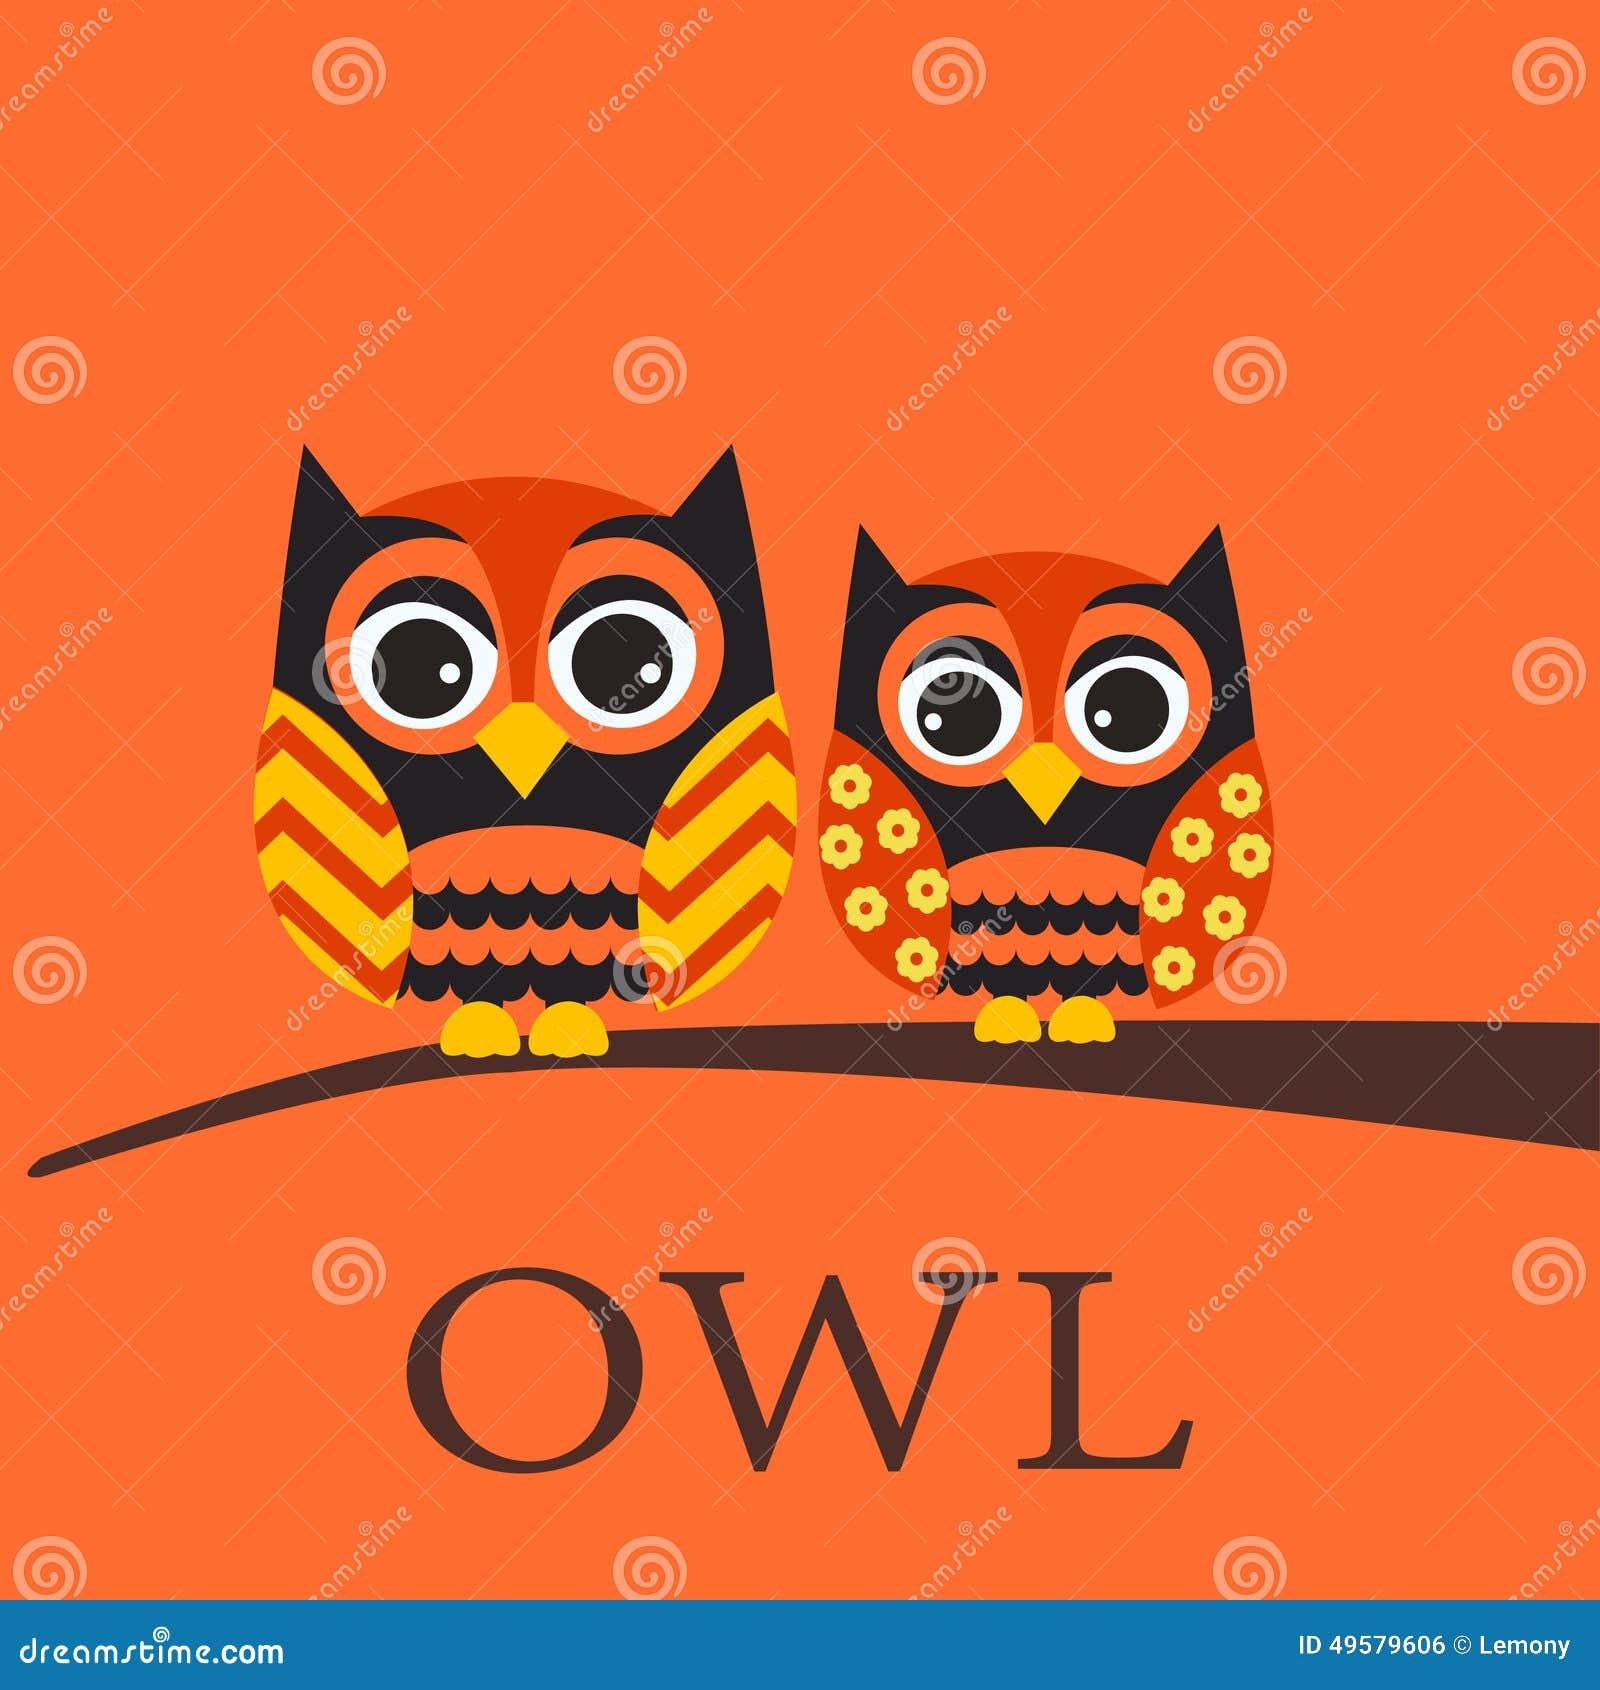 owl design wallpaper